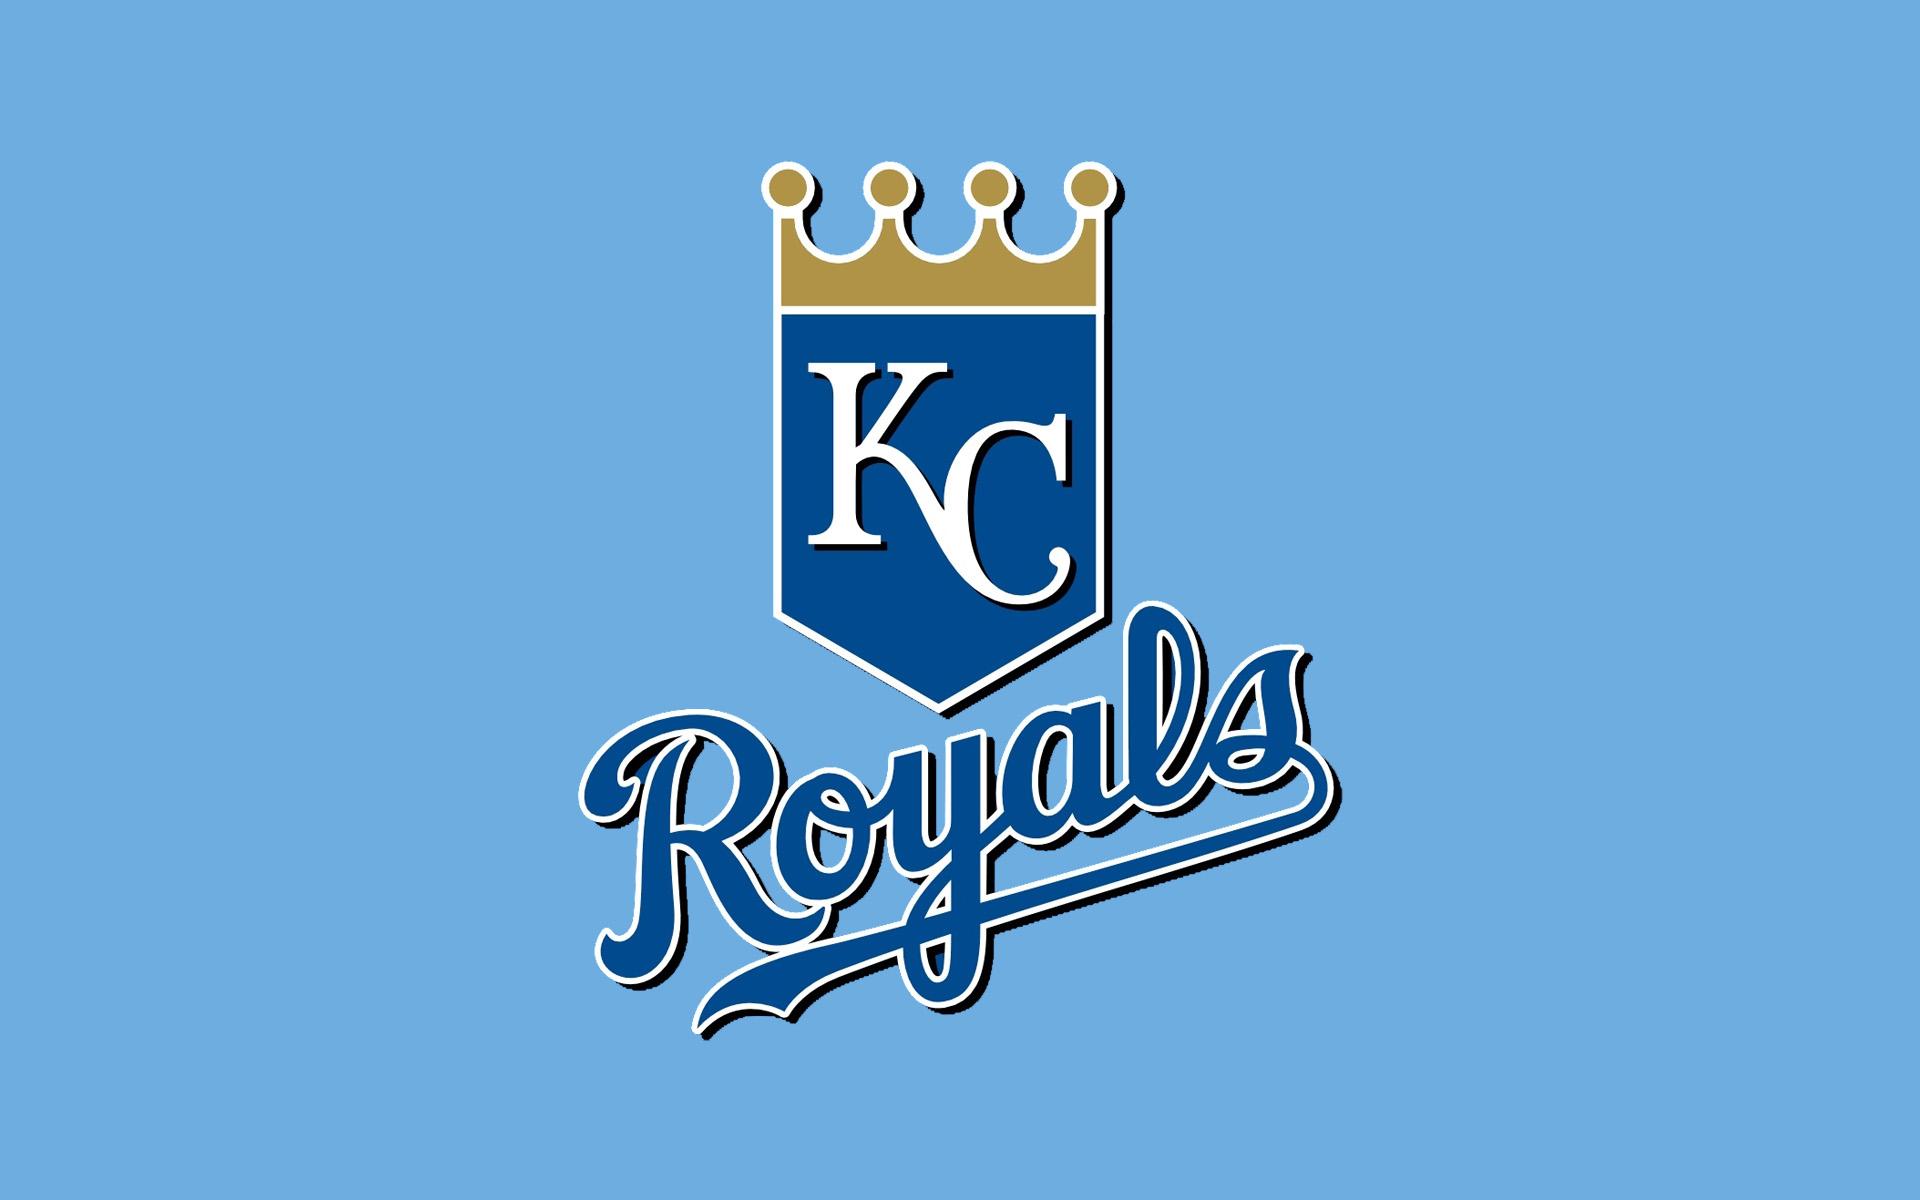 KANSAS CITY ROYALS mlb baseball 8 wallpaper background 1920x1200